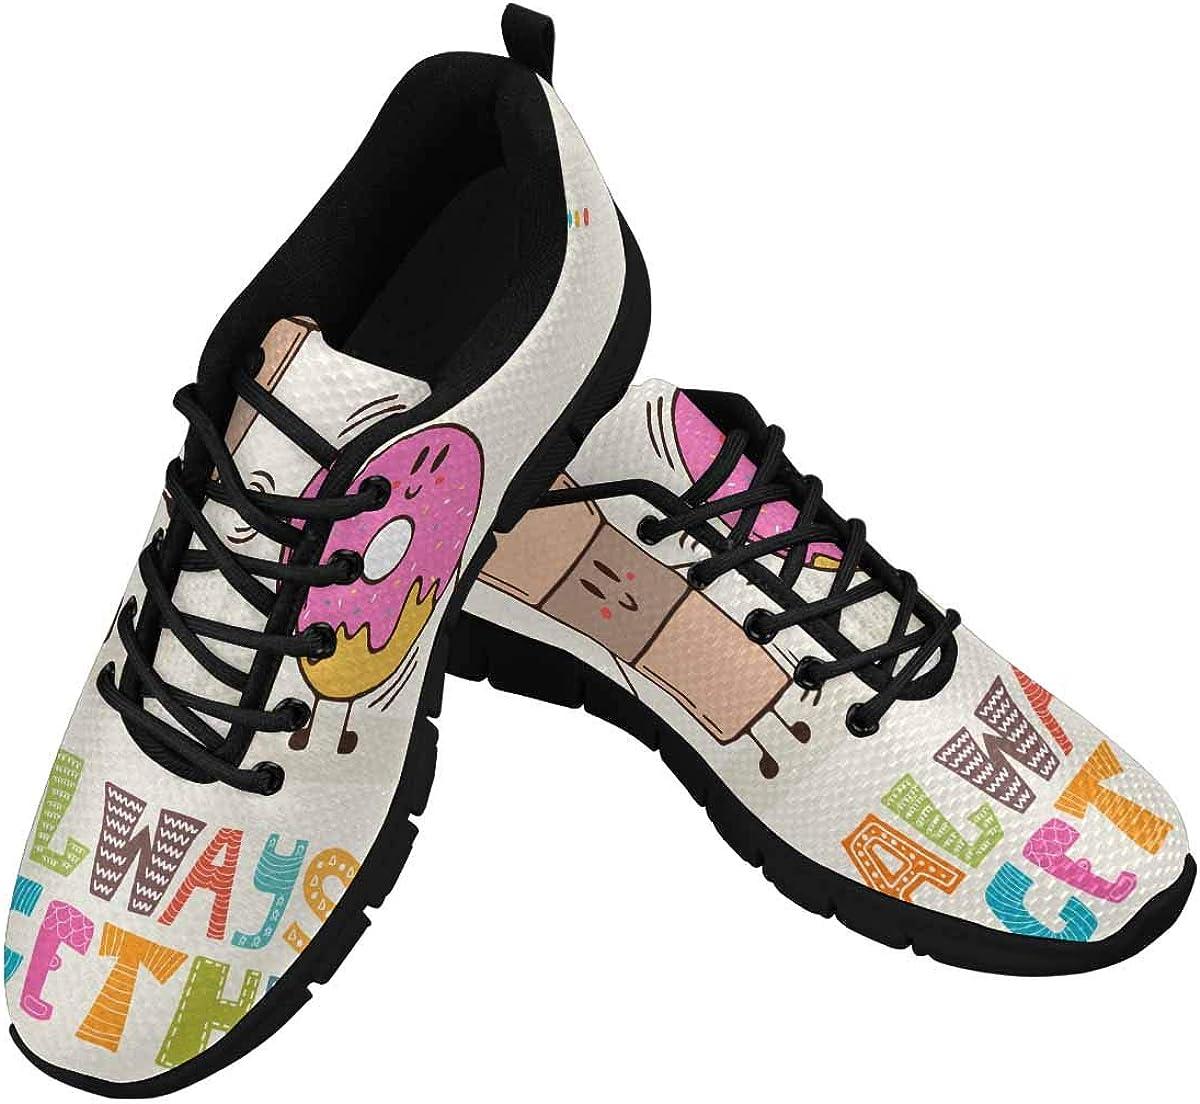 InterestPrint We Like Always Together Pattern Women's Athletic Walking Shoes Casual Mesh Comfortable Work Sneakers